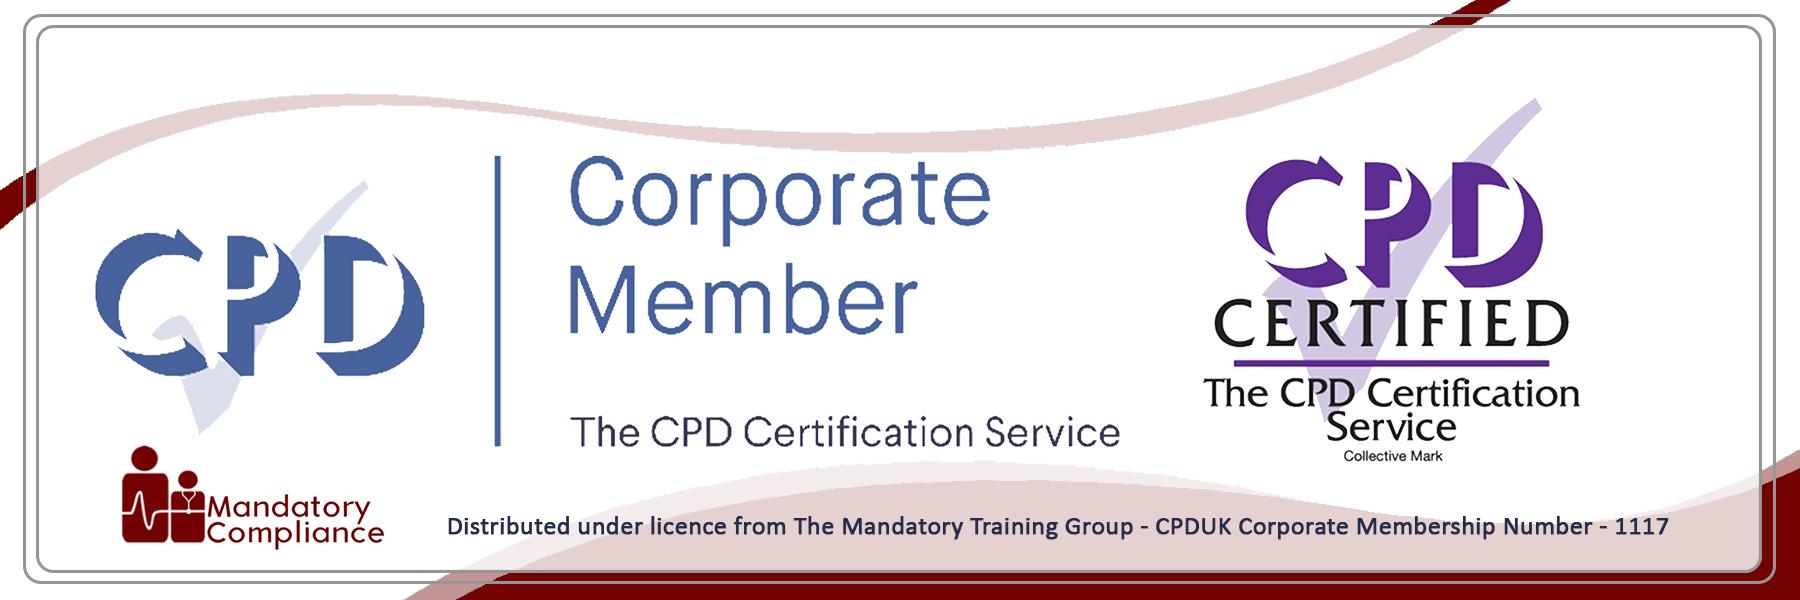 Care Certificate Standard 15 - E-Learning Courses - Mandatory Compliance UK -